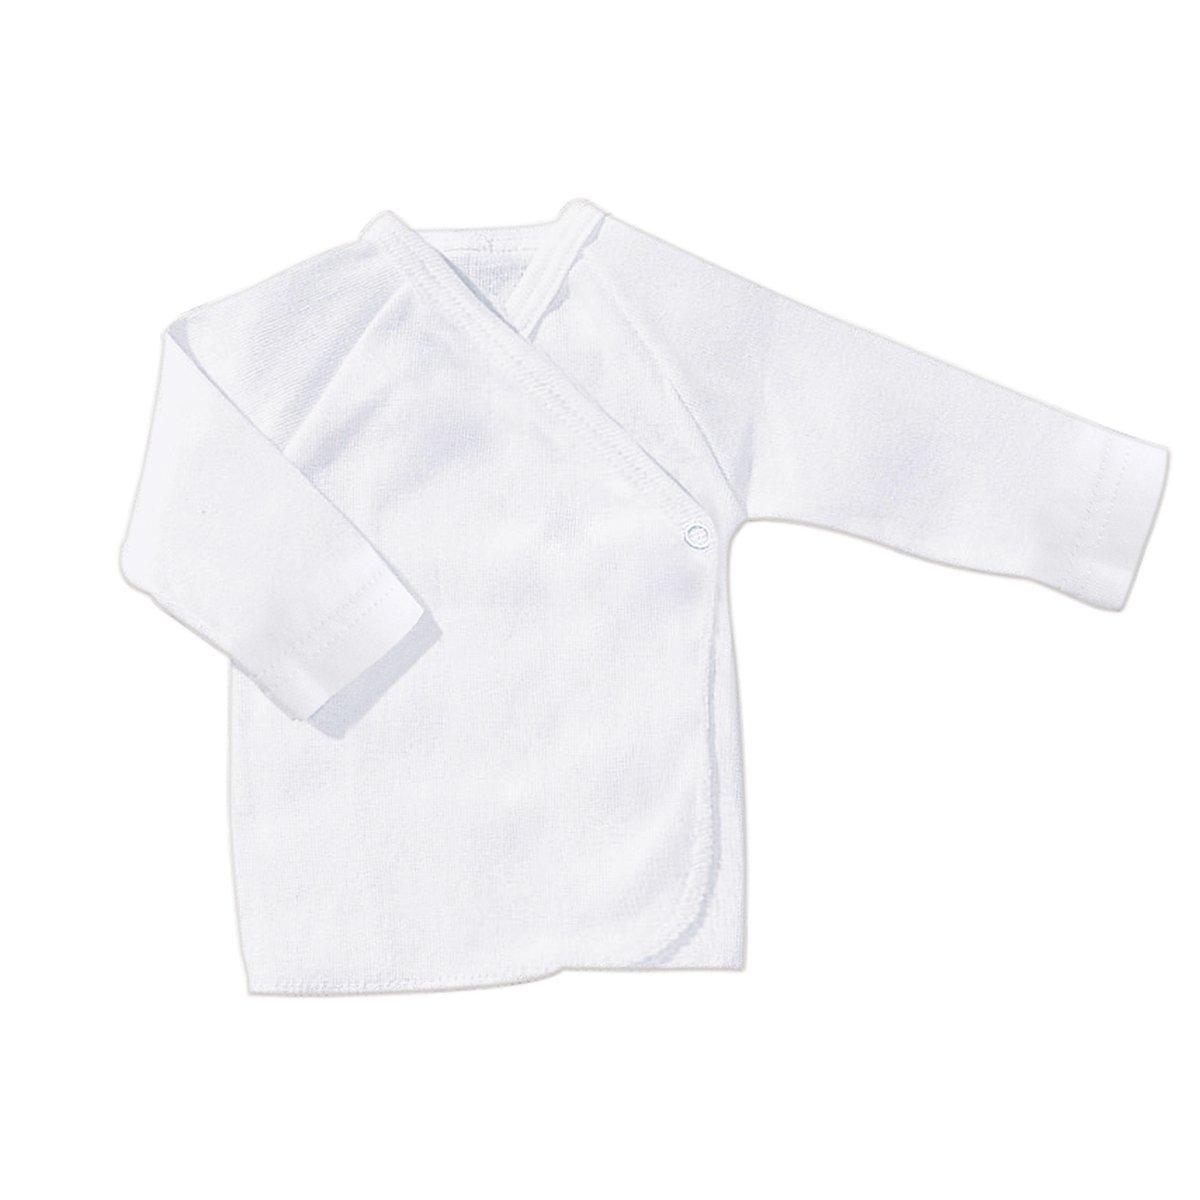 Bornino Baby Raglan-Flügelhemd/Basics Babybekleidung/Pullover / Wickelshirt/Größe 50 / weiß